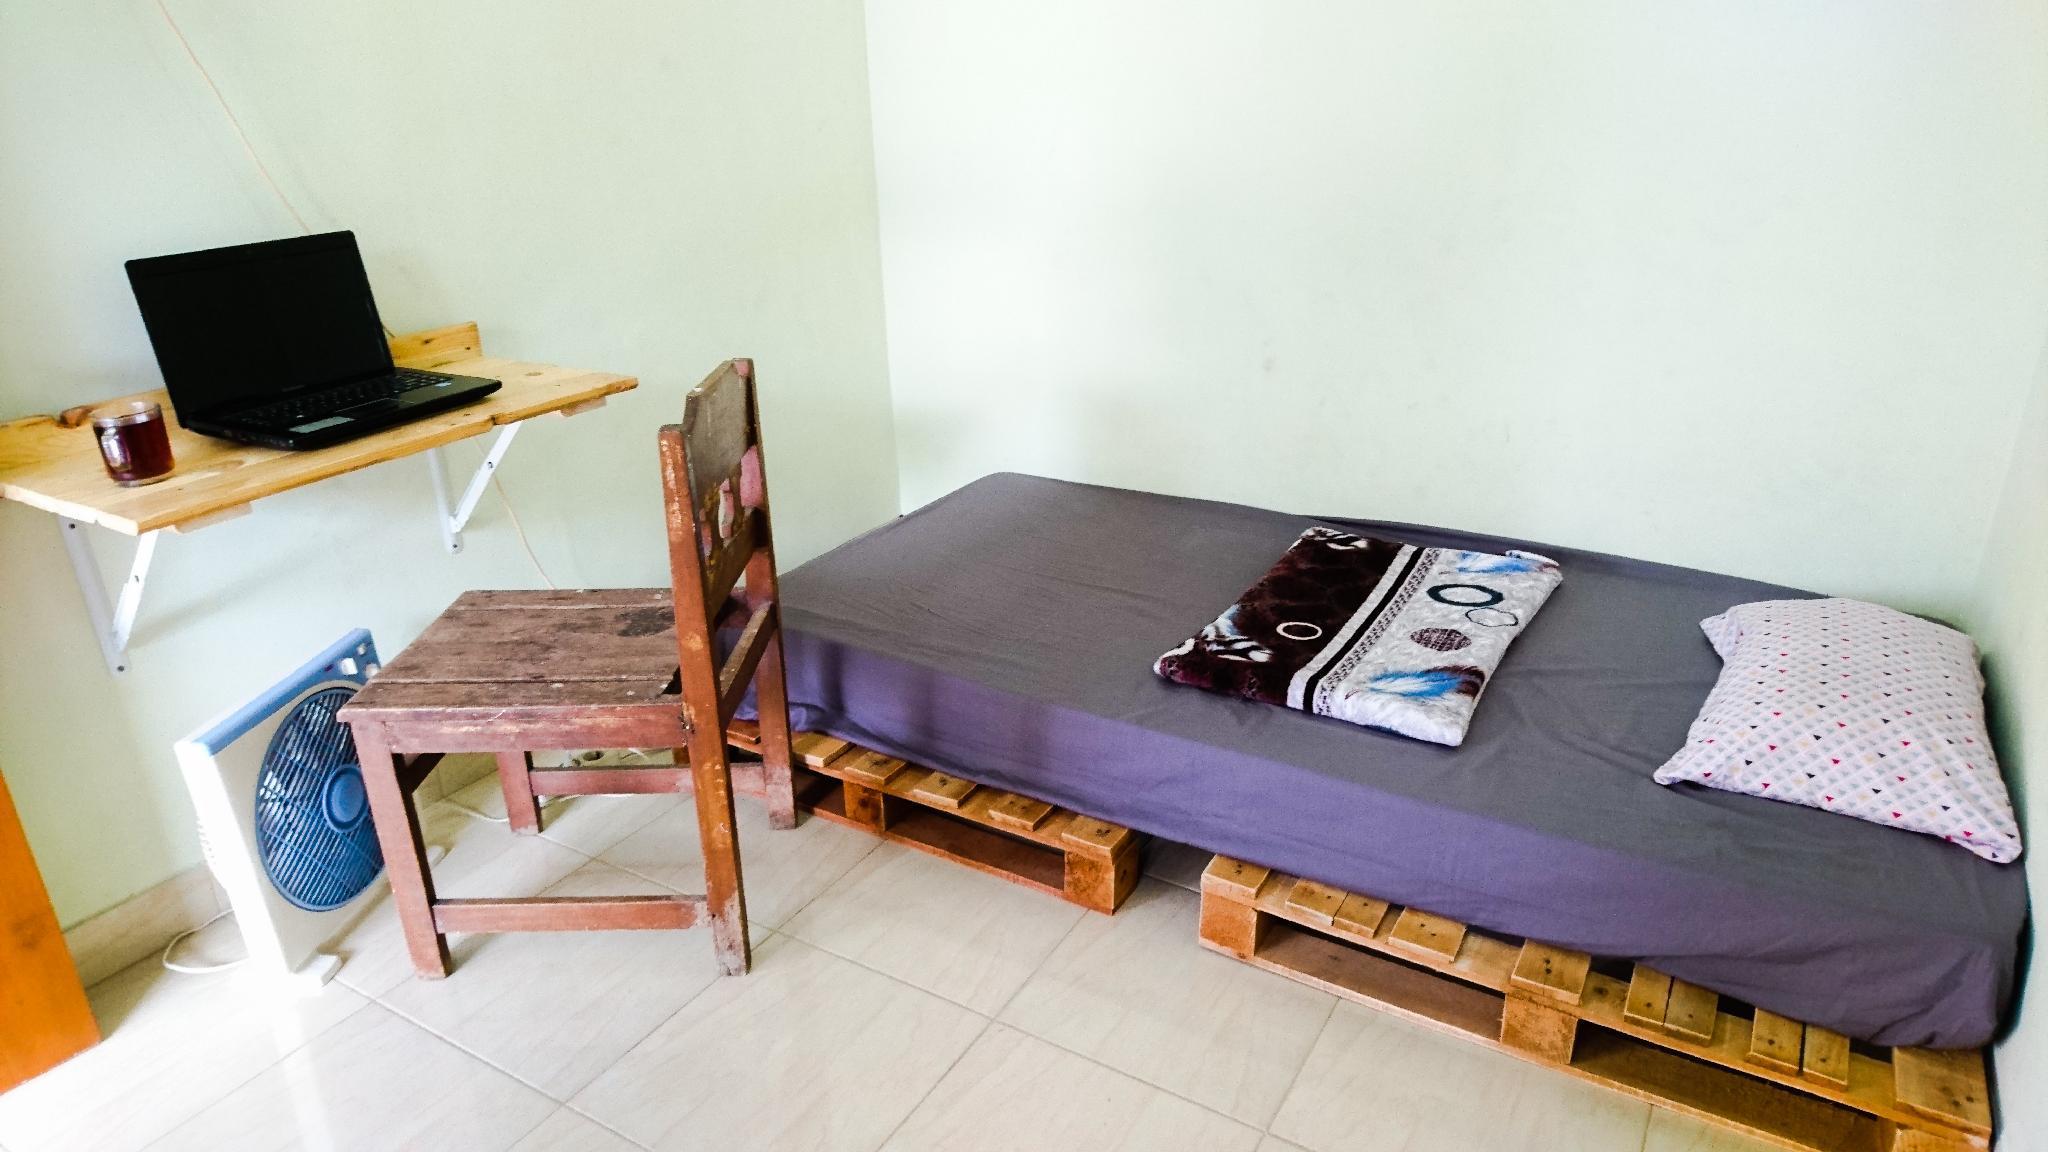 Srikaloka 12   Minimalist Room For Backpackers